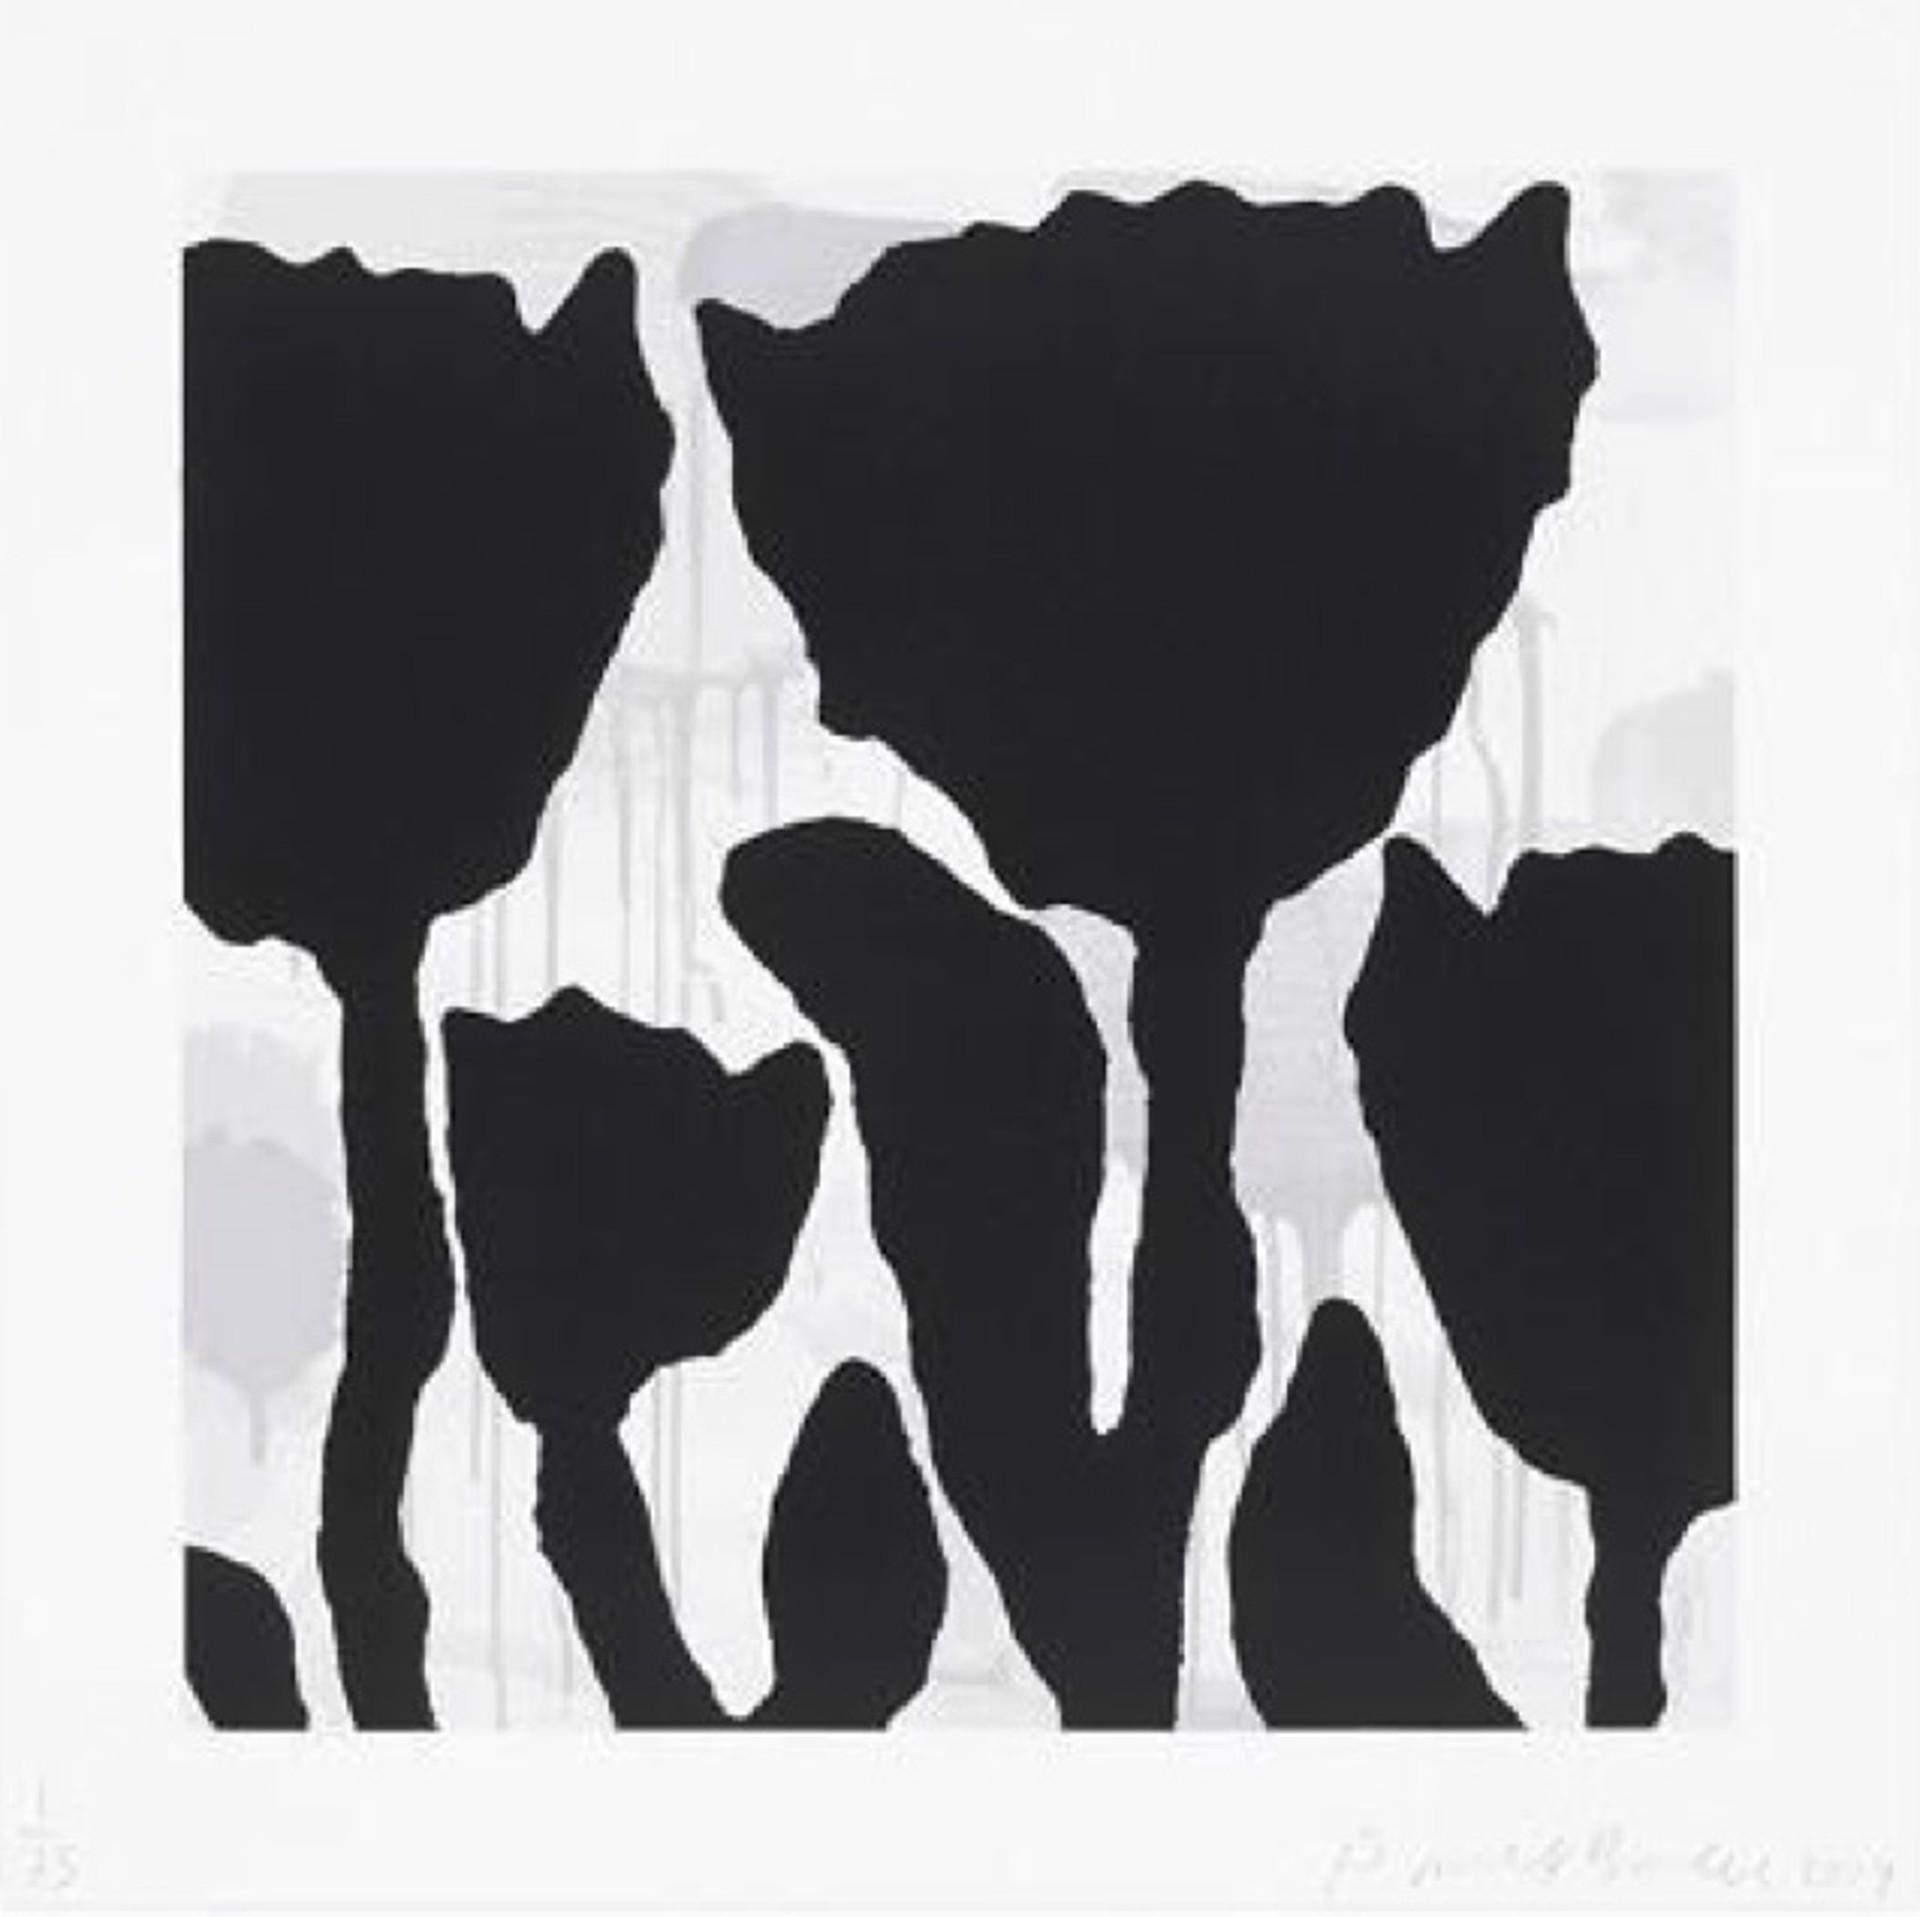 Flower Studies, III by Donald Baechler